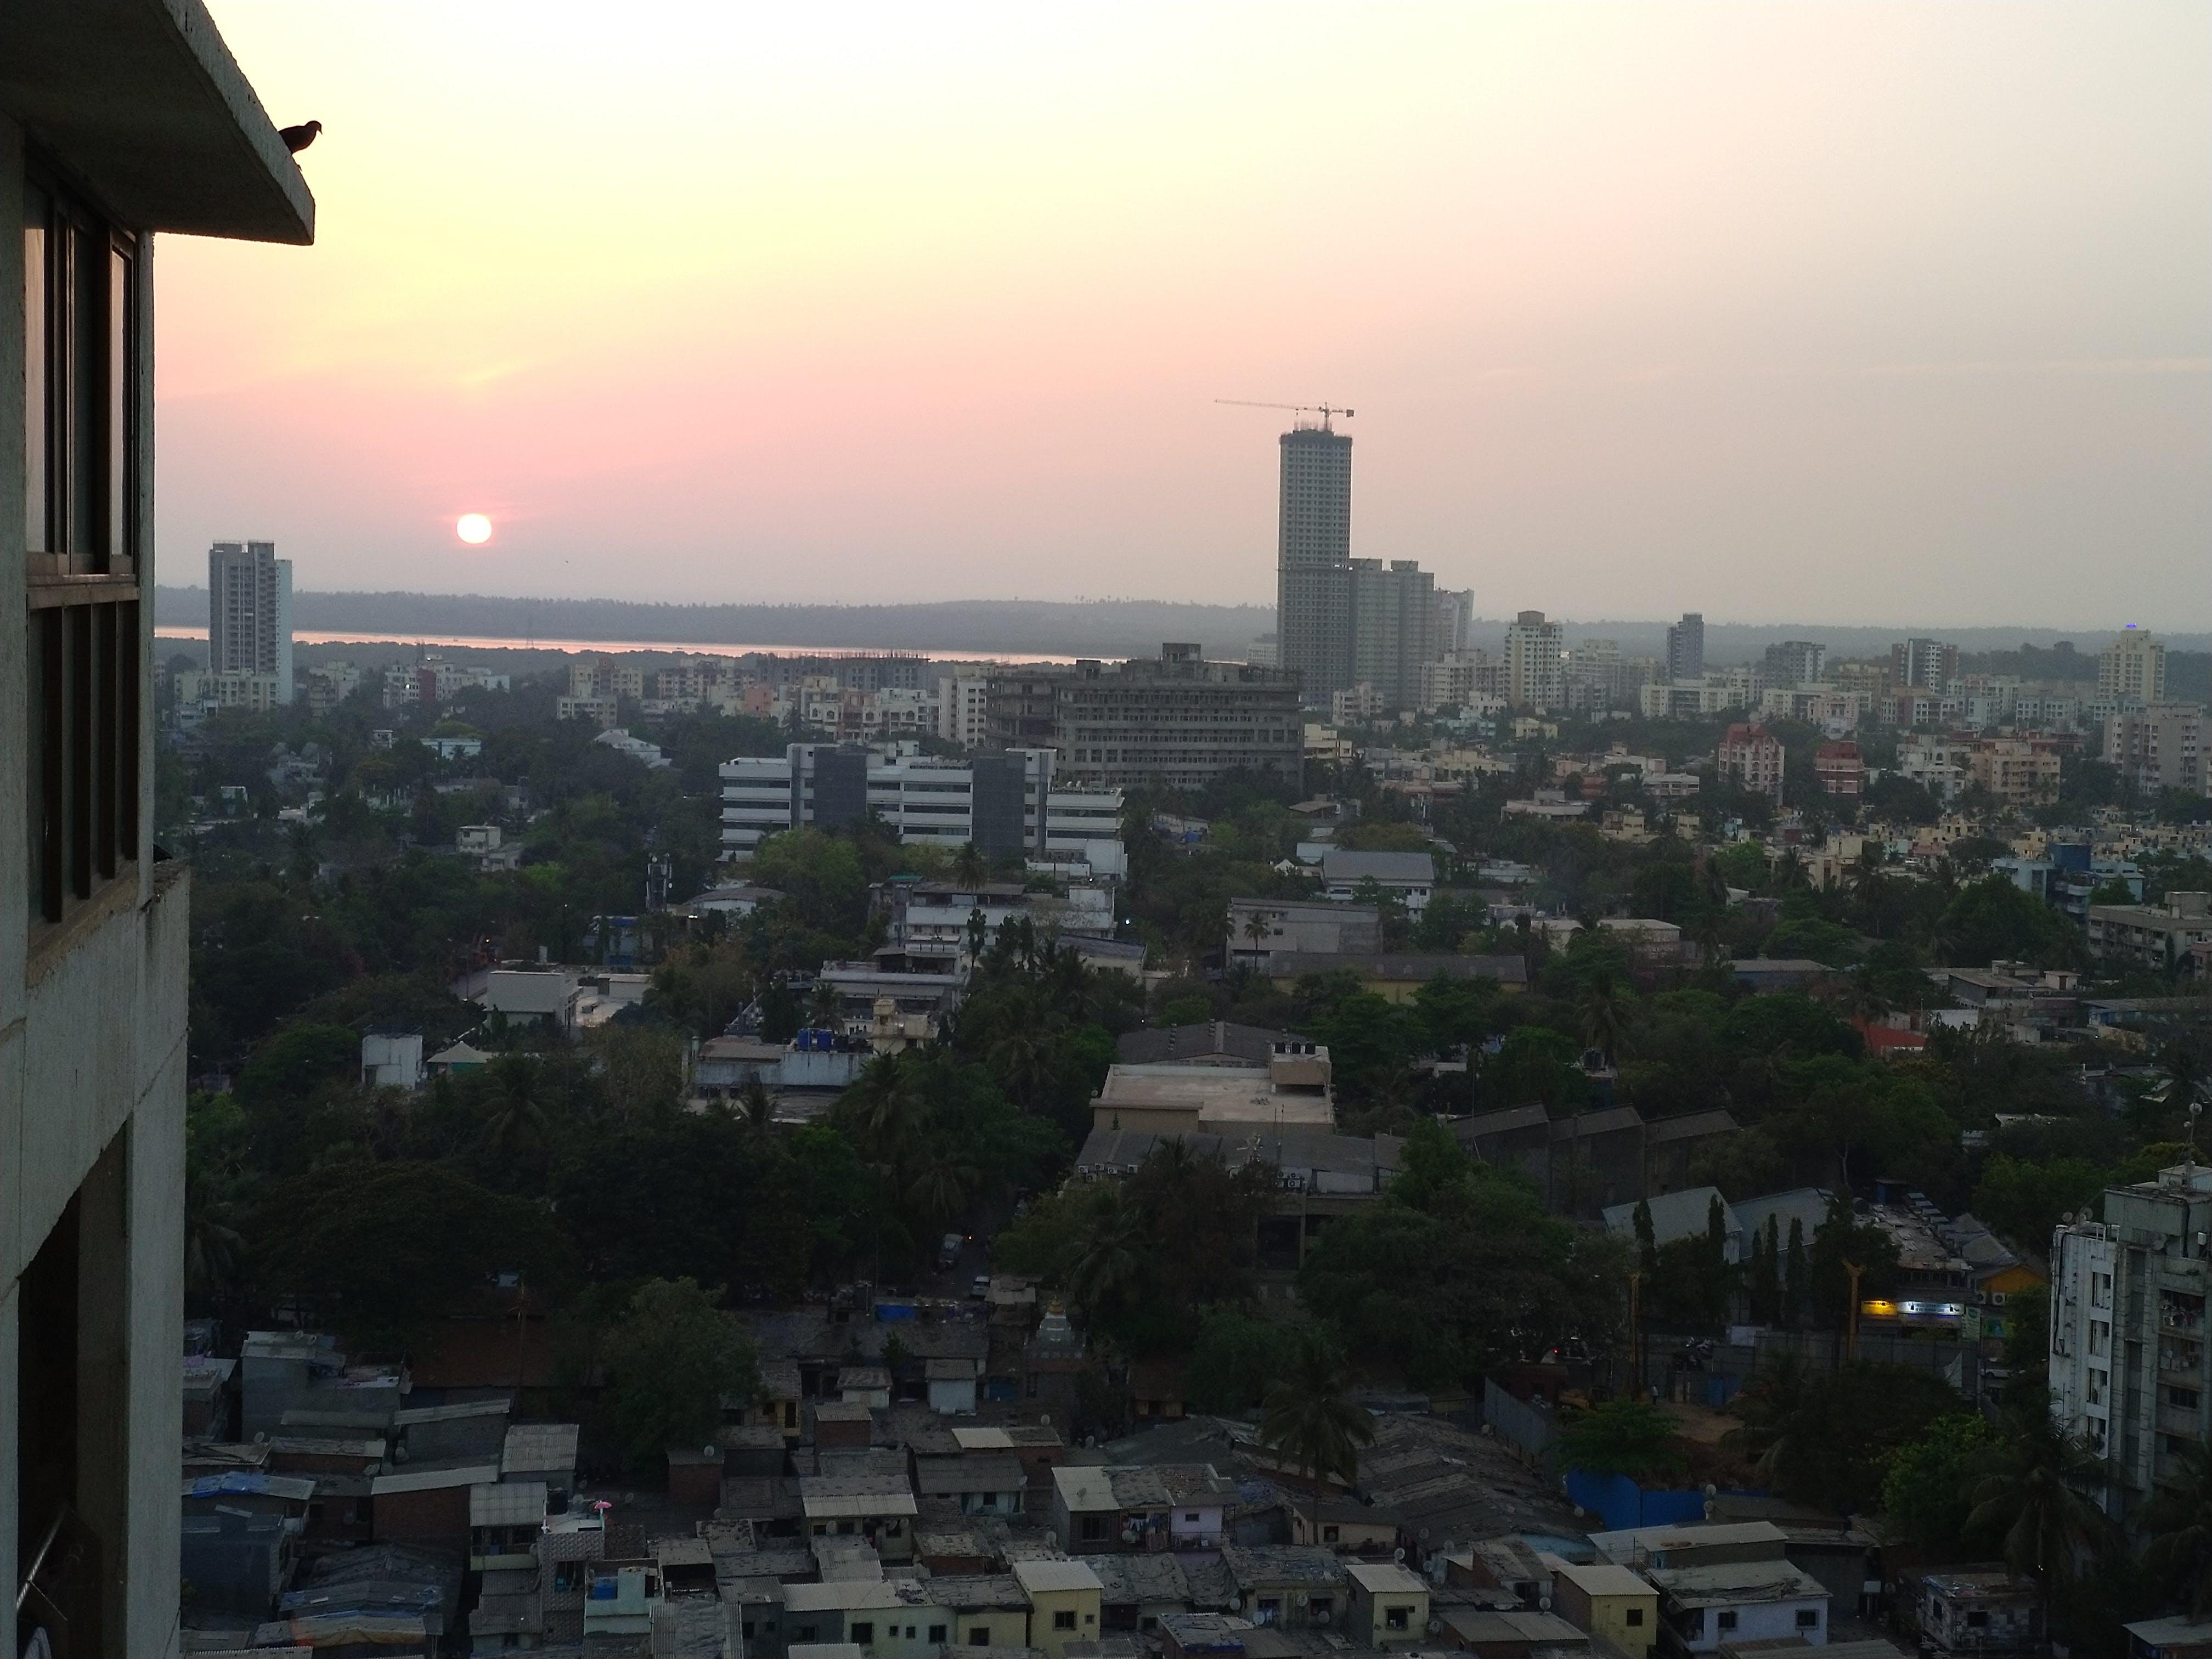 Free stock photo of city view